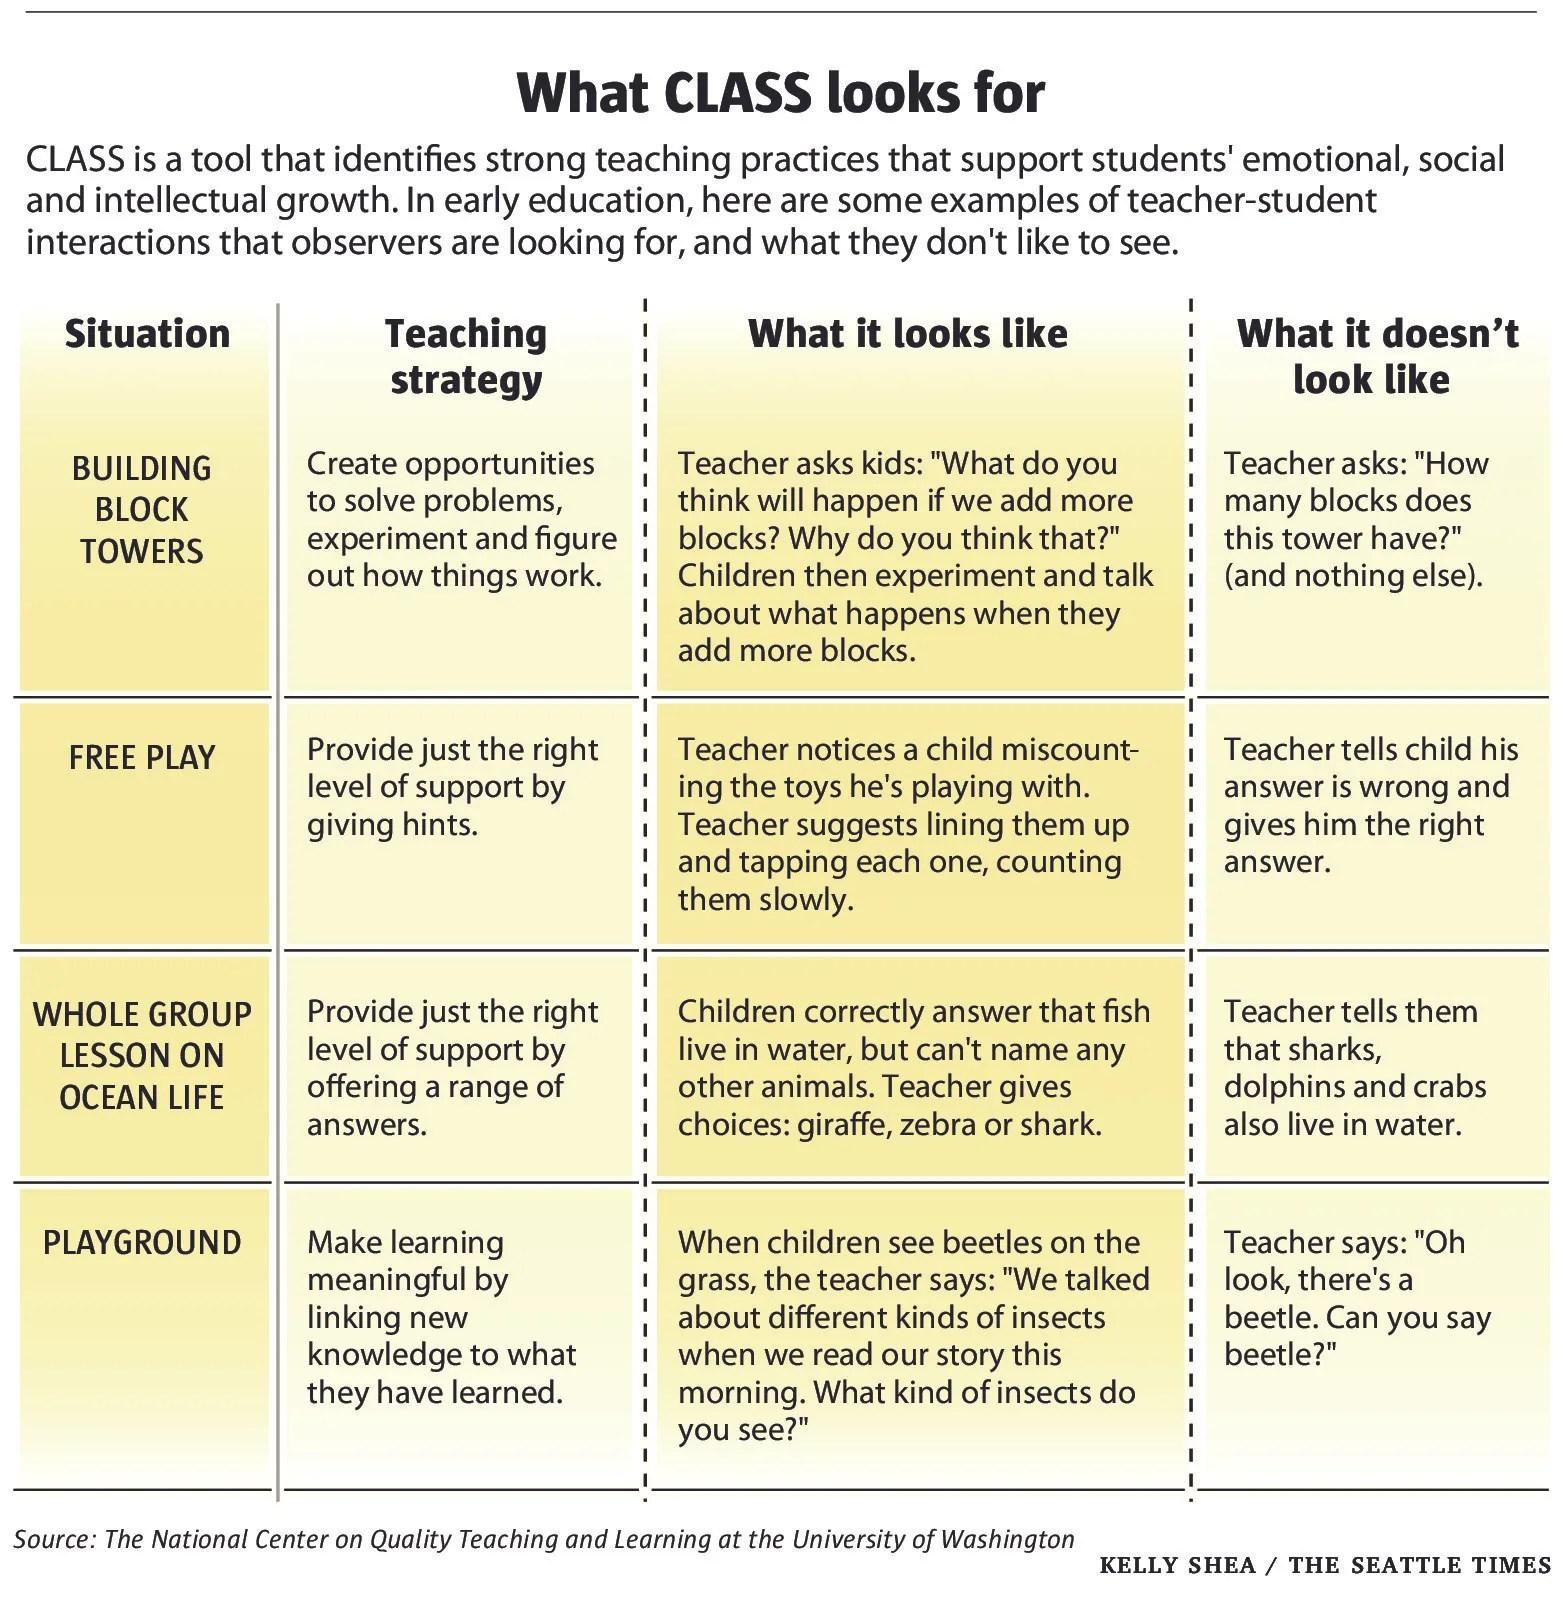 Classroom Observers Using New Tools To Make Teachers